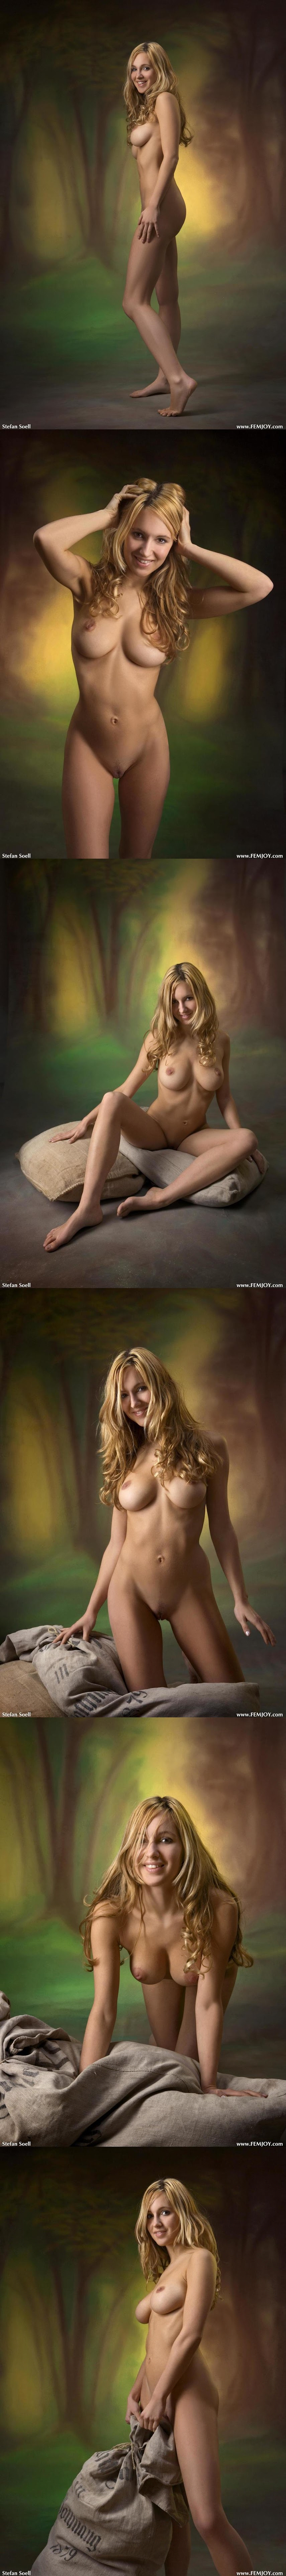 FEdf  - 2005-12-29 - Iveta - Boldness x40 3000px sexy girls image jav